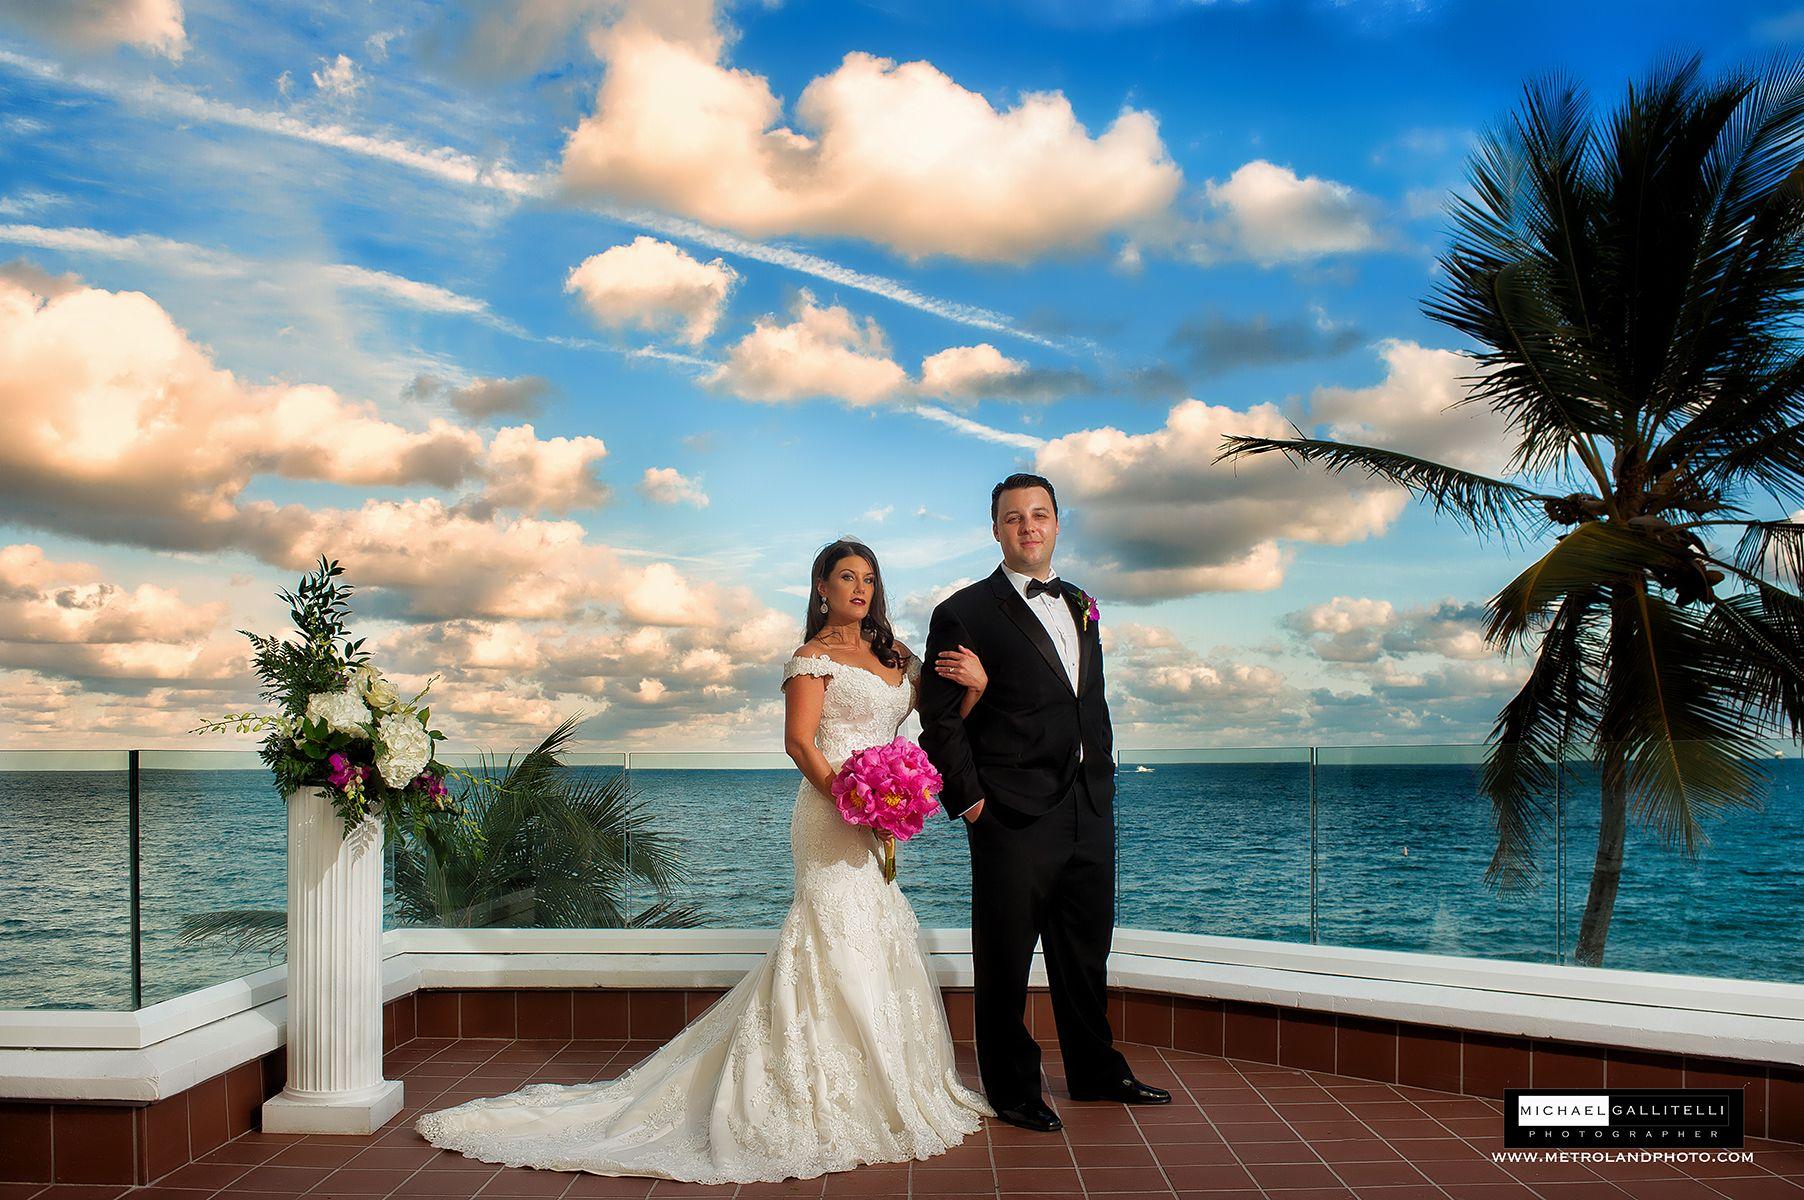 Pin On Florida Weddings Pelican Grand Beach Resort